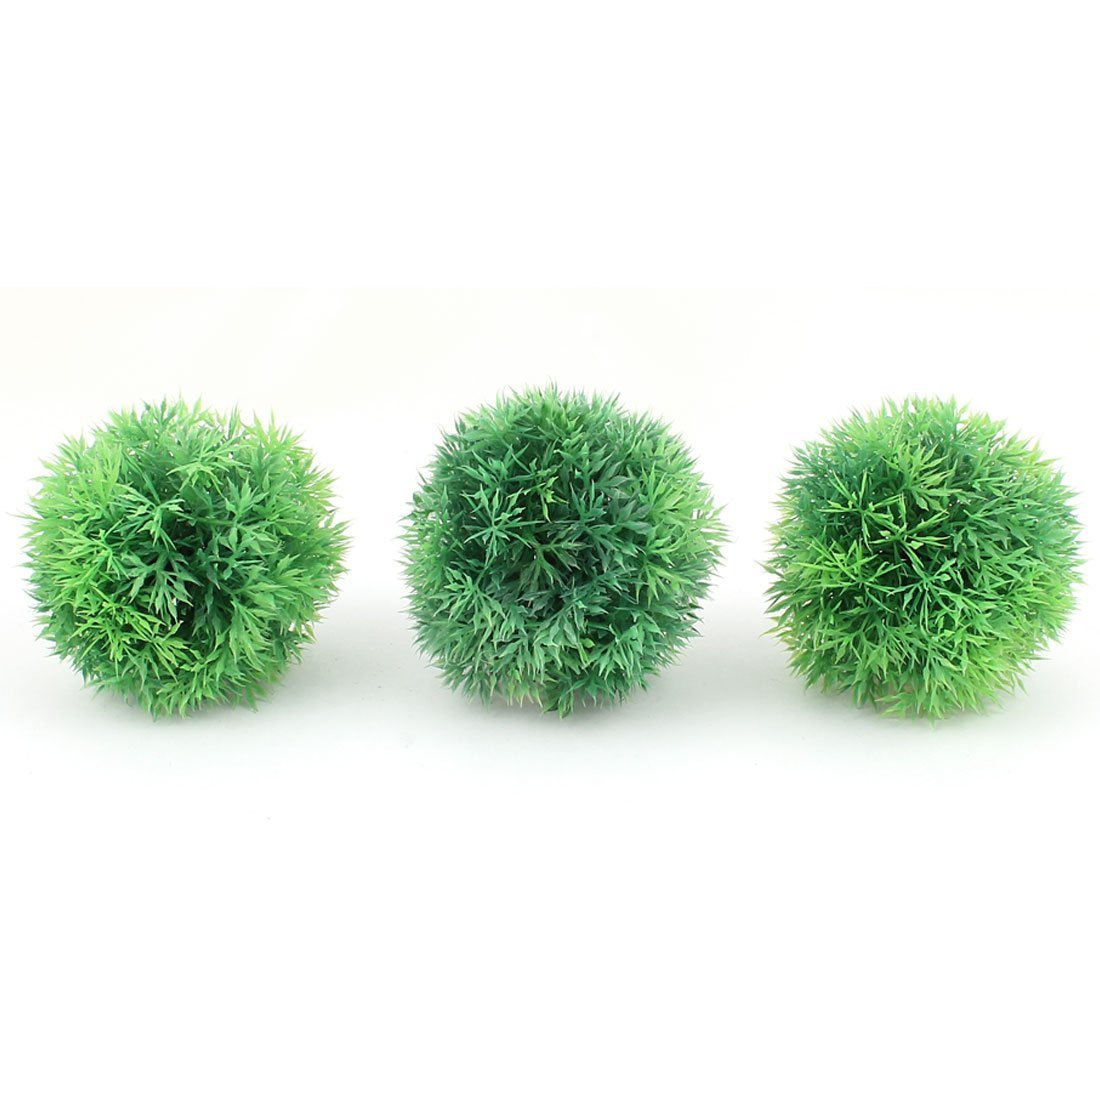 1Pc Aquarium Fish Tank Artificial Water Plant Coral Decor Grass Green Yellow